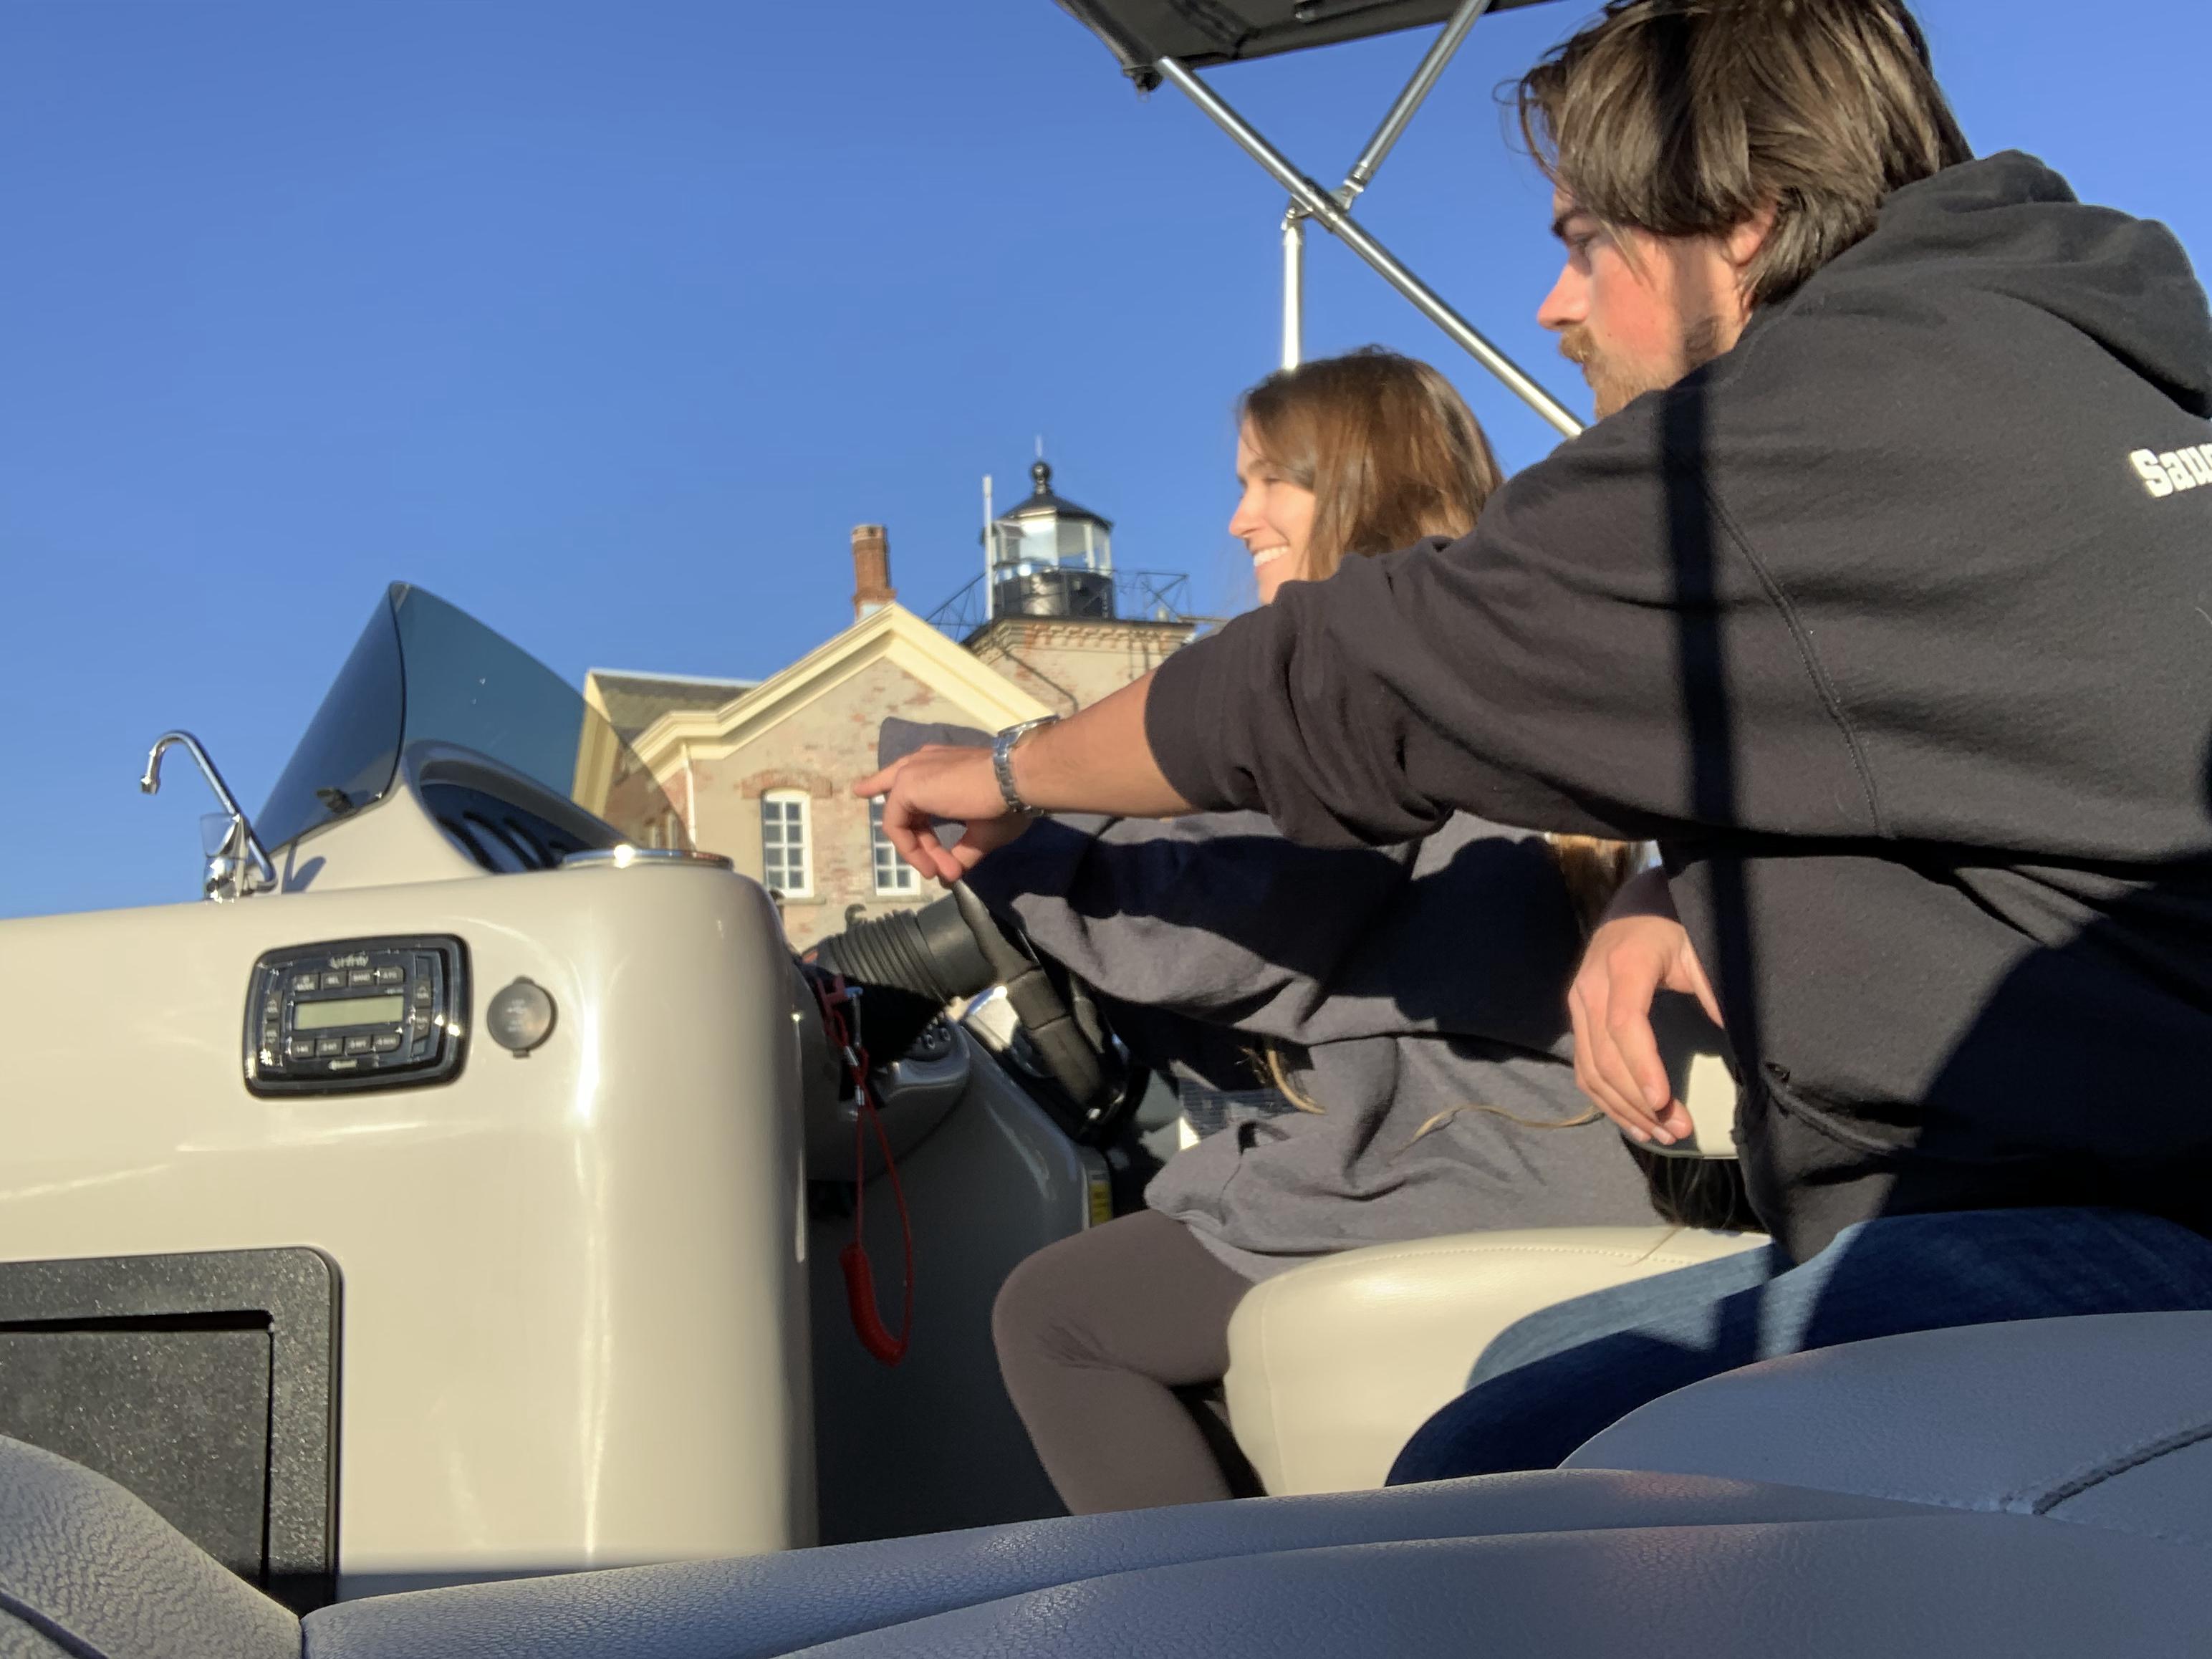 2 Hour Boating Instruction